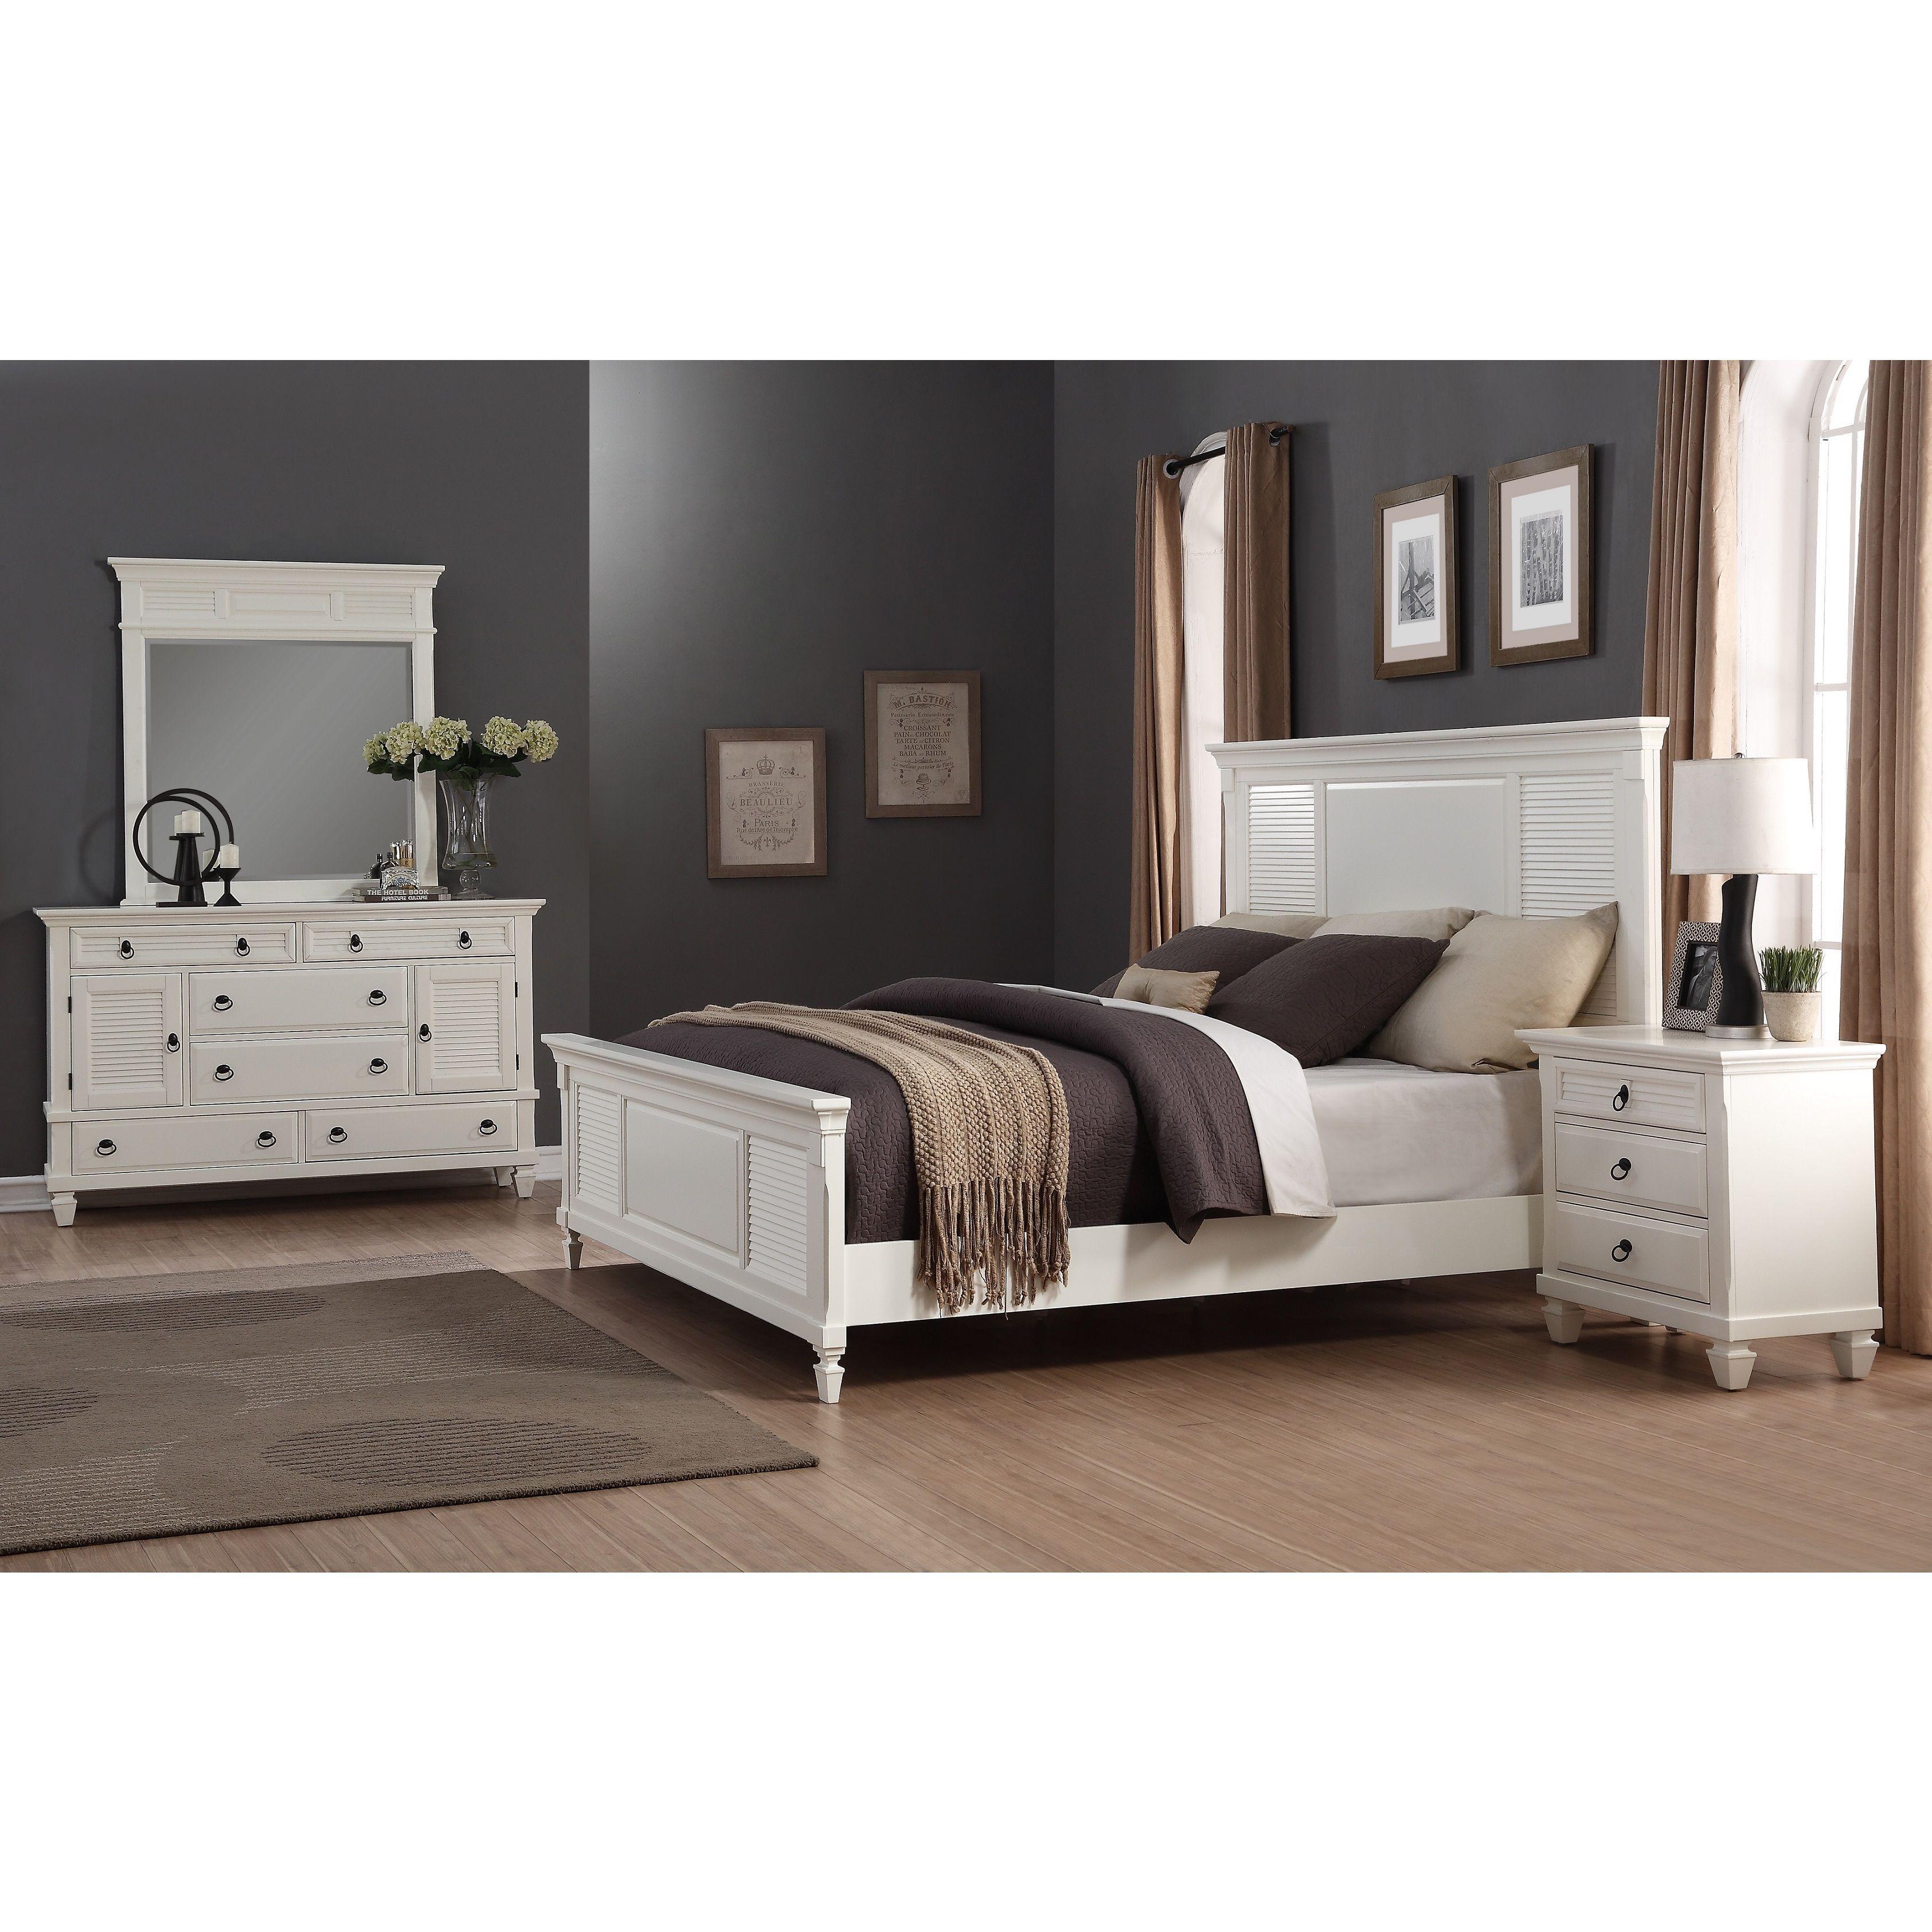 Regitina piece queensize bedroom furniture set decor